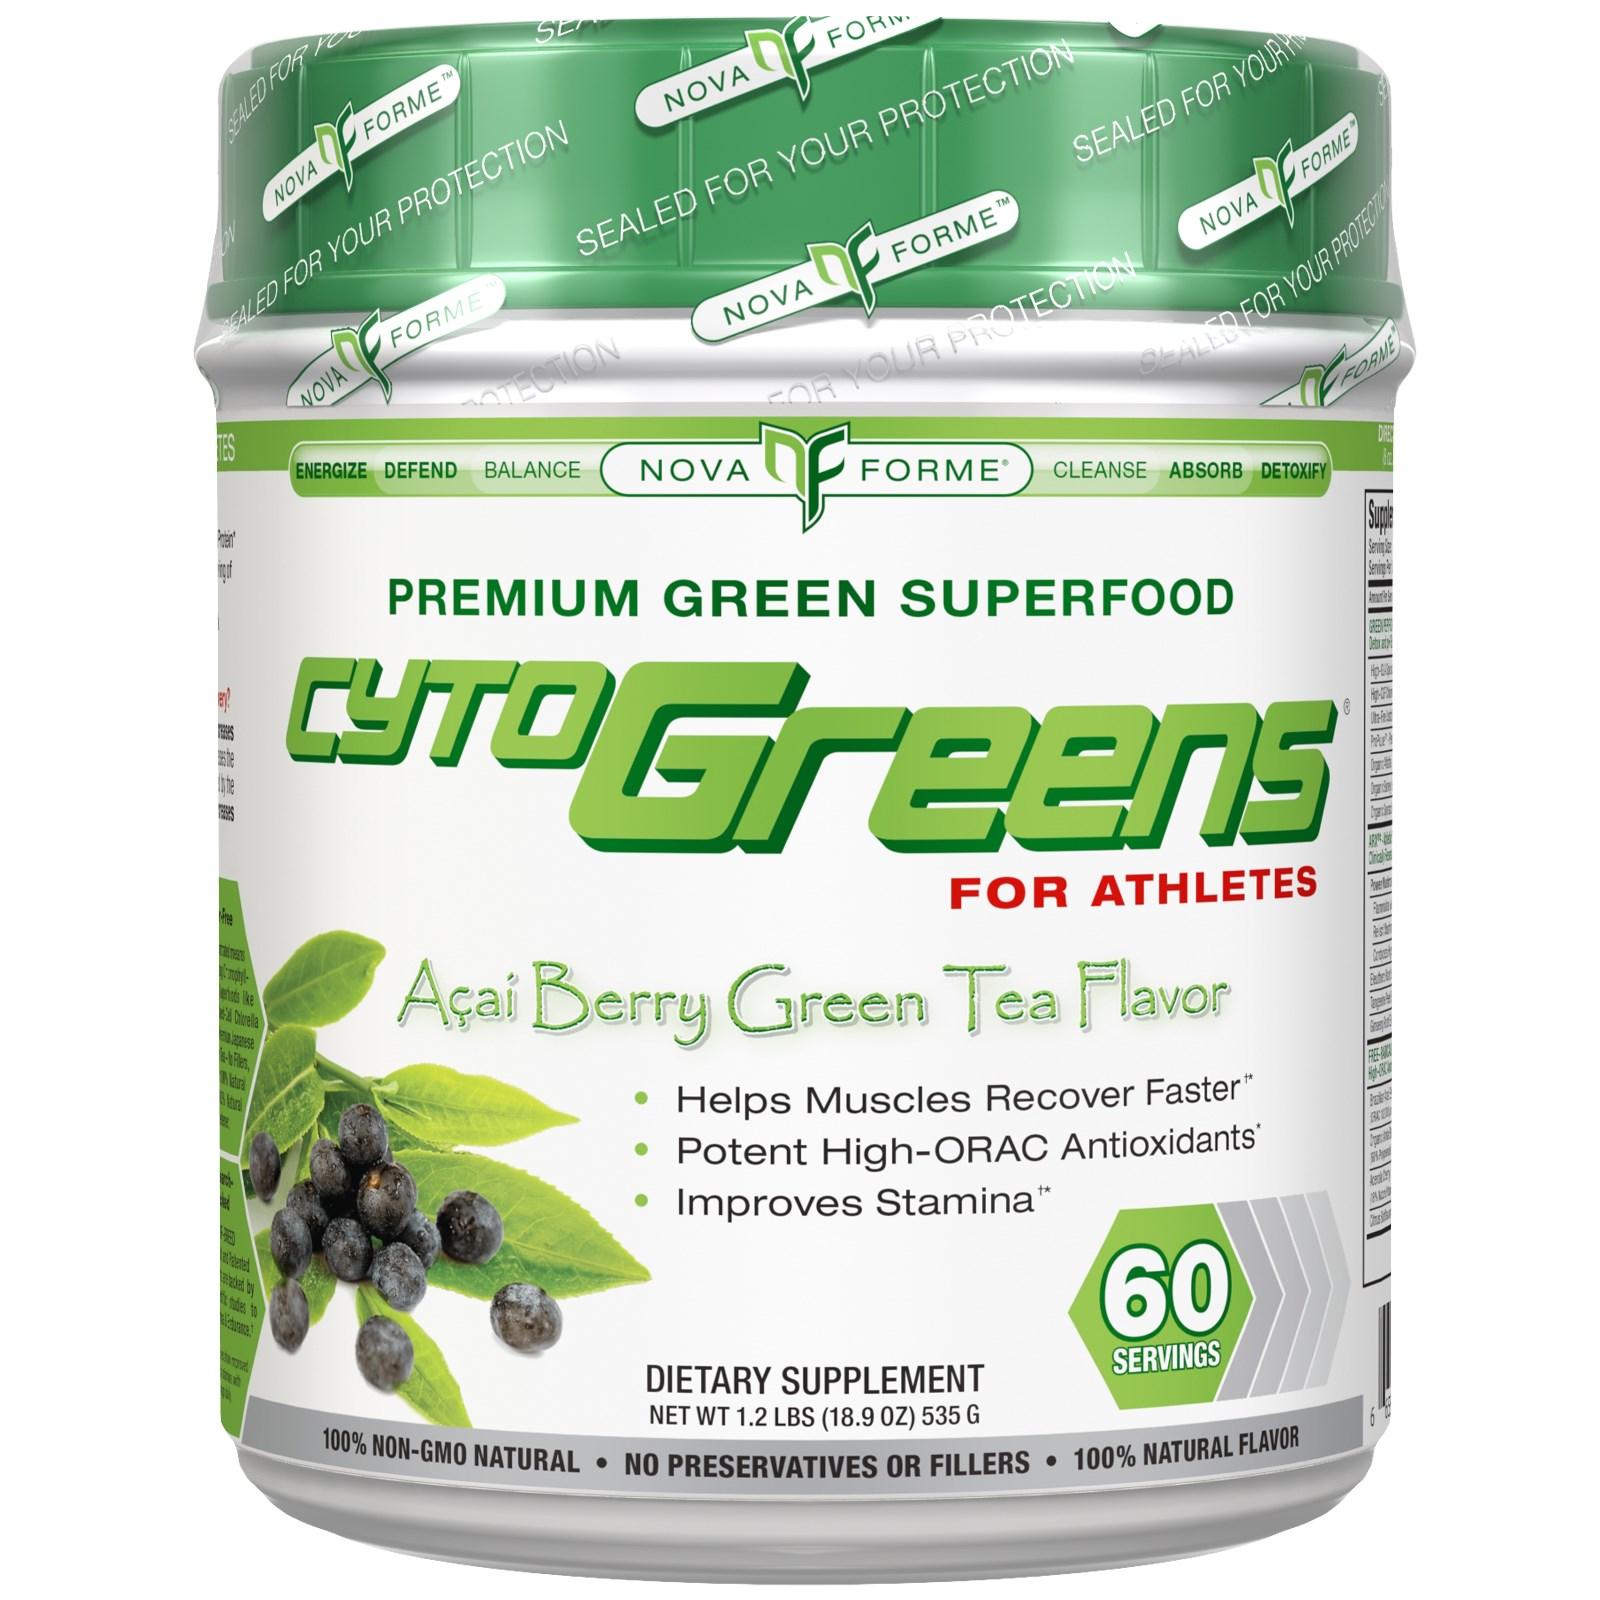 NovaForme, CytoGreens, Premium Green Superfood for Athletes, Acai Berry Green Tea Flavor, 18.9 oz (535 g)